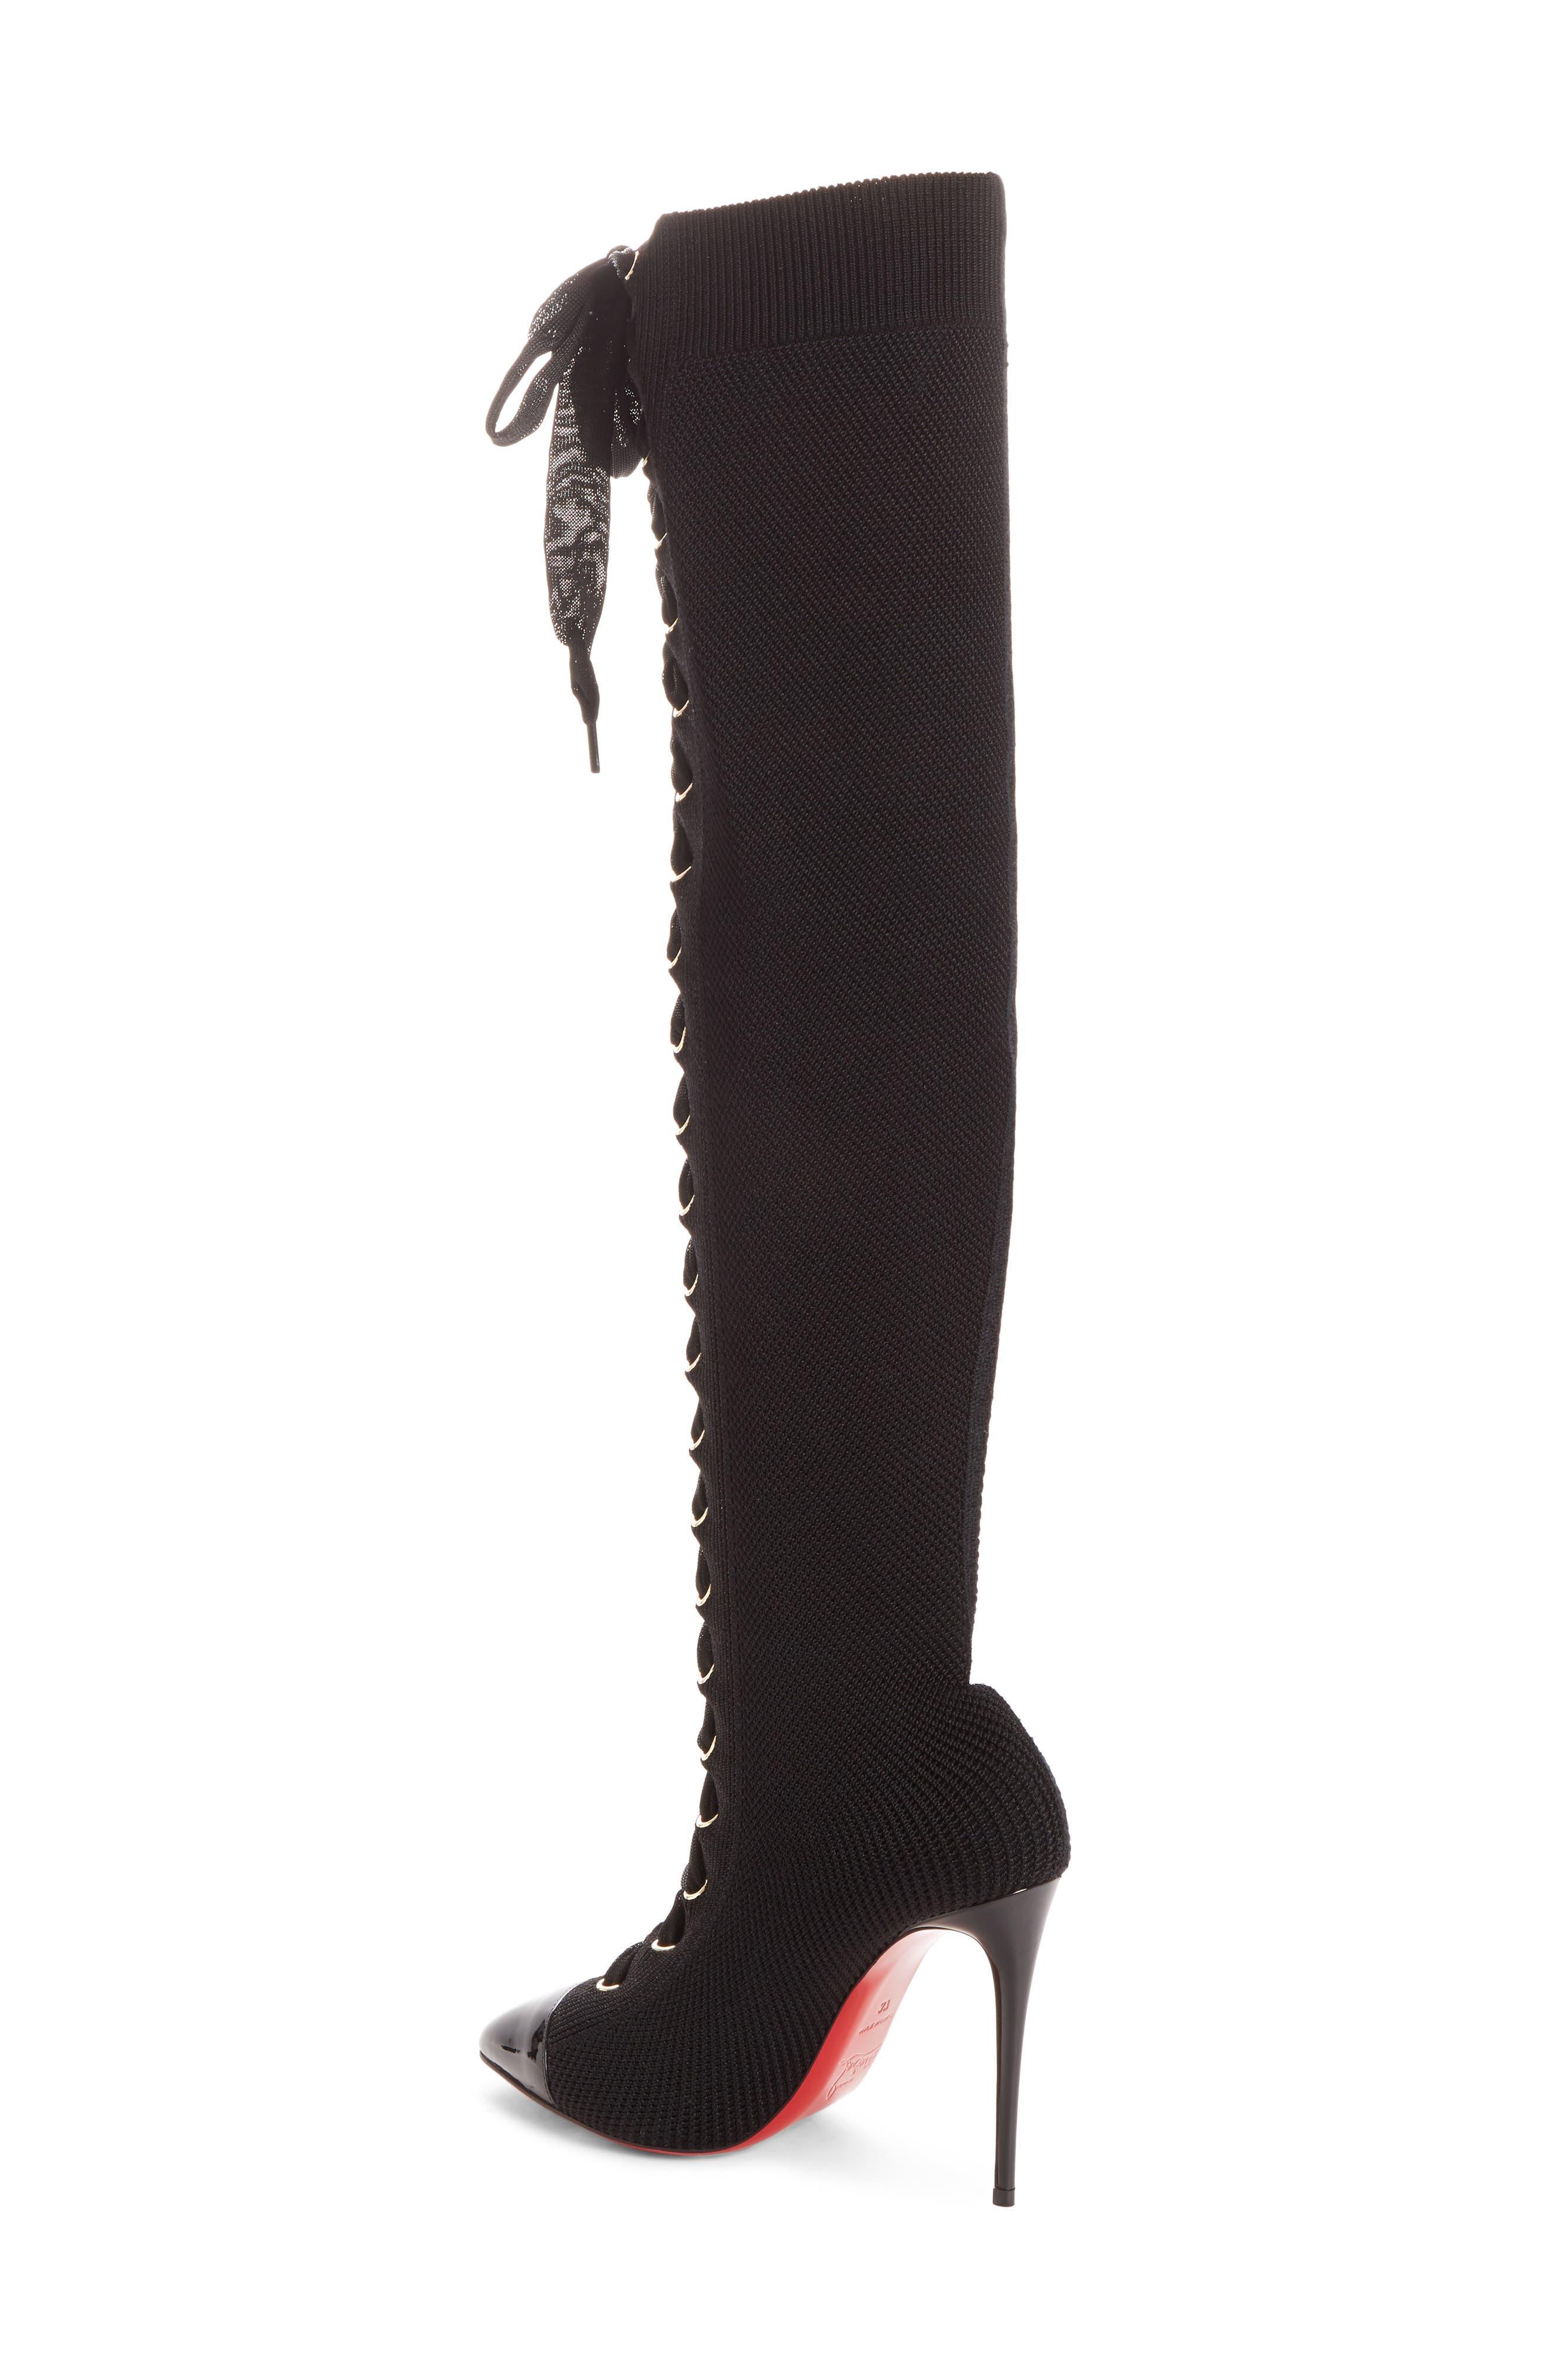 af55b5666 Over-the-Knee Boots for Women | Nordstrom